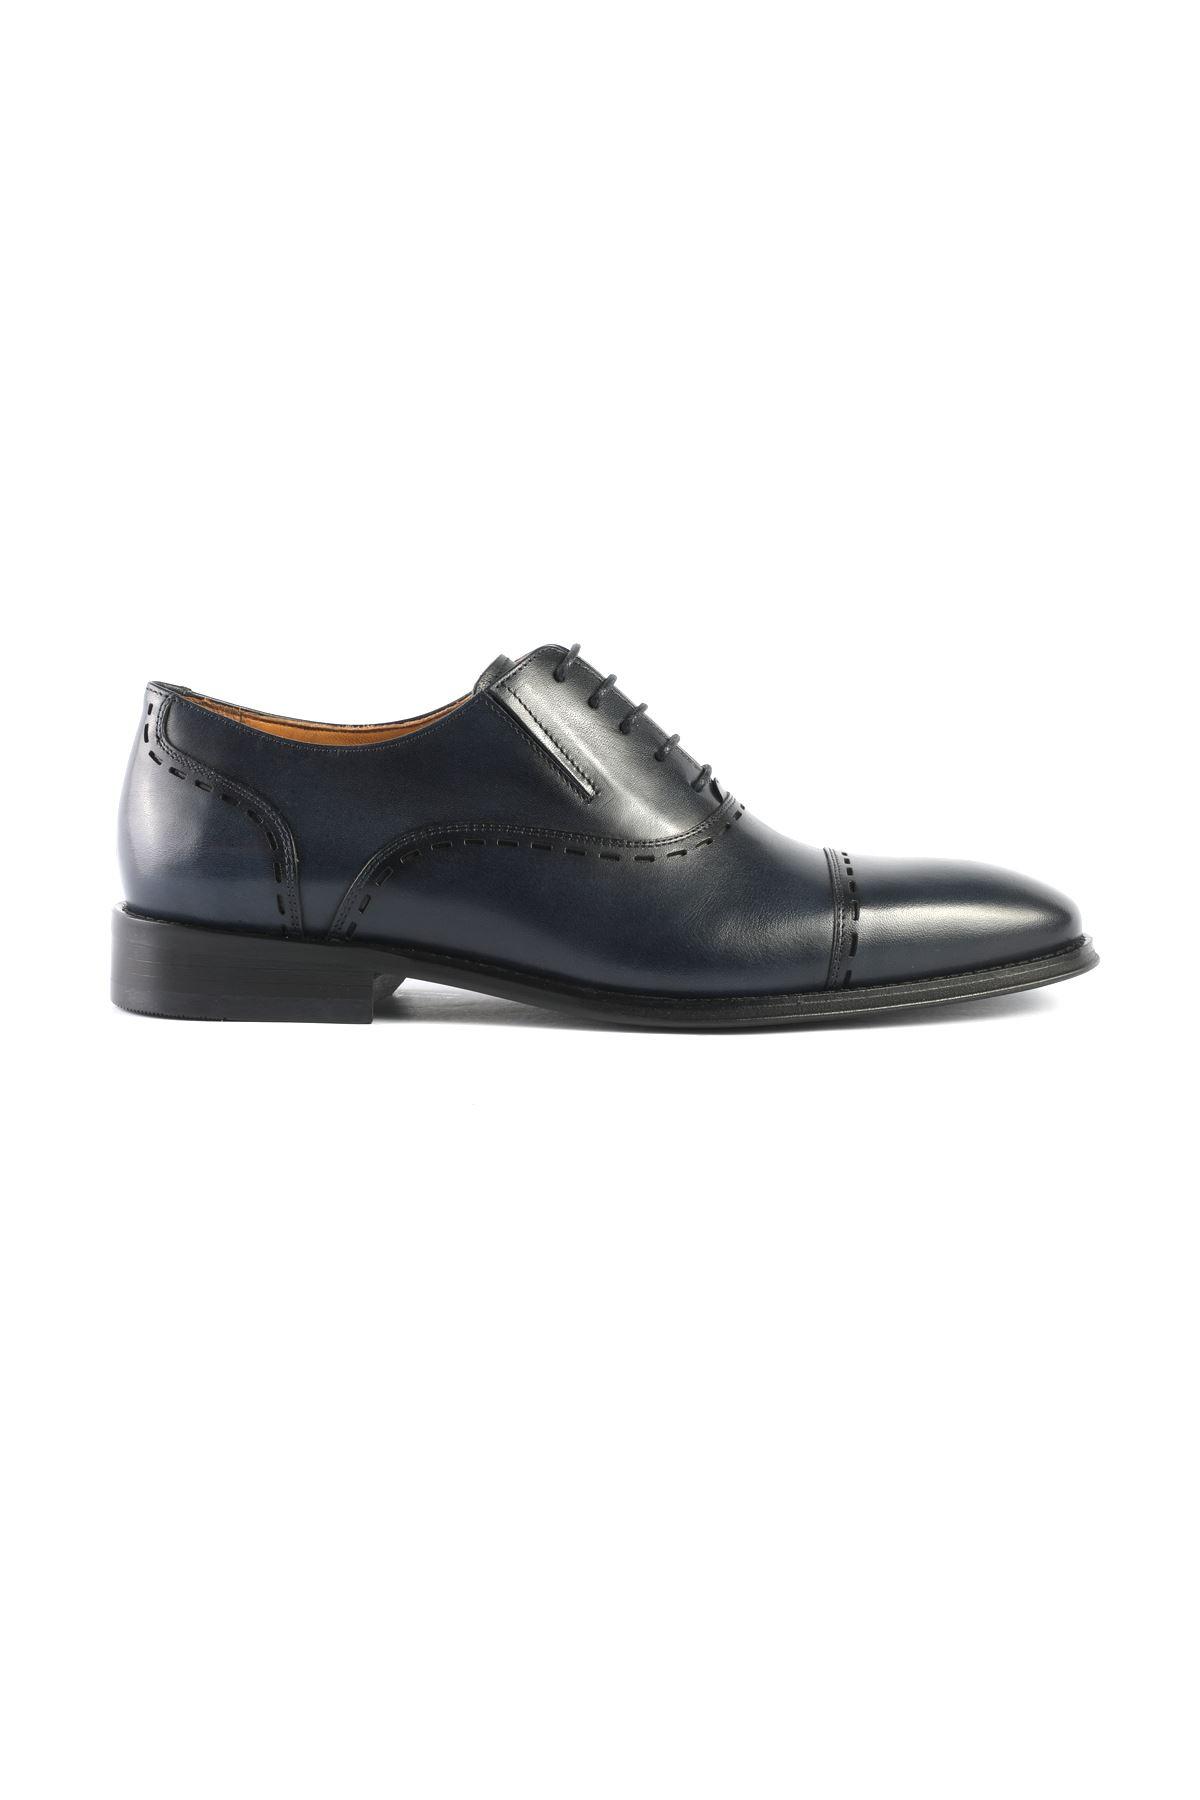 Libero L3352 Lacivert Klasik Ayakkabı